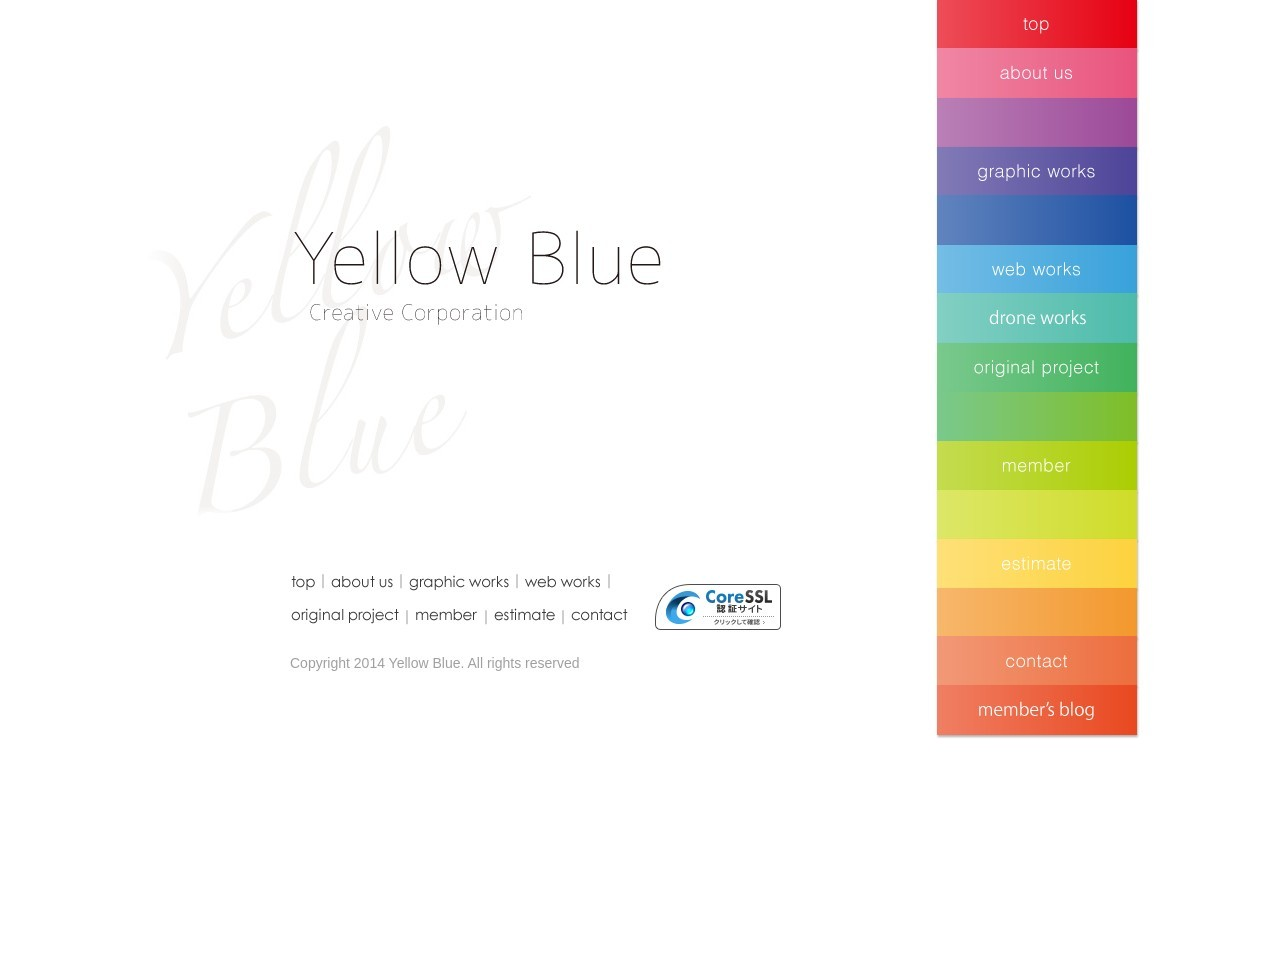 Yellow Blue|好奇心いっぱいのデザイン会社です。